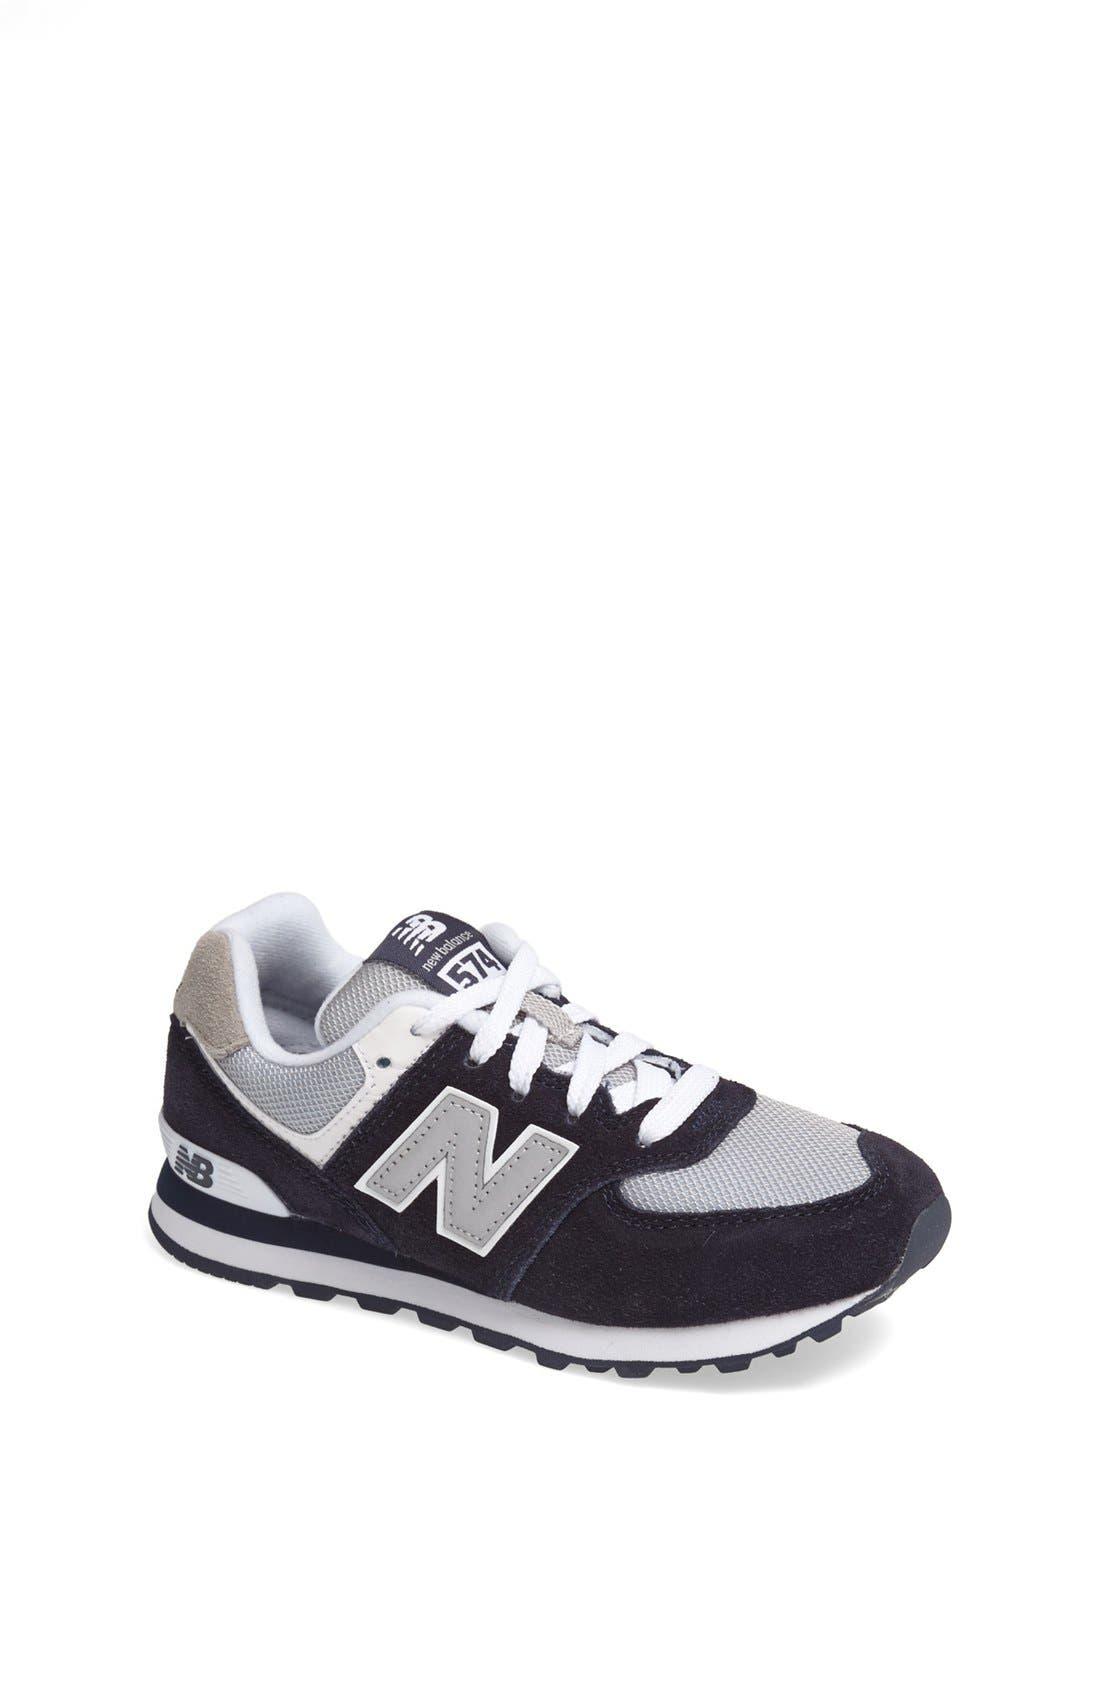 Main Image - New Balance '574 Classic' Sneaker (Toddler & Little Kid)